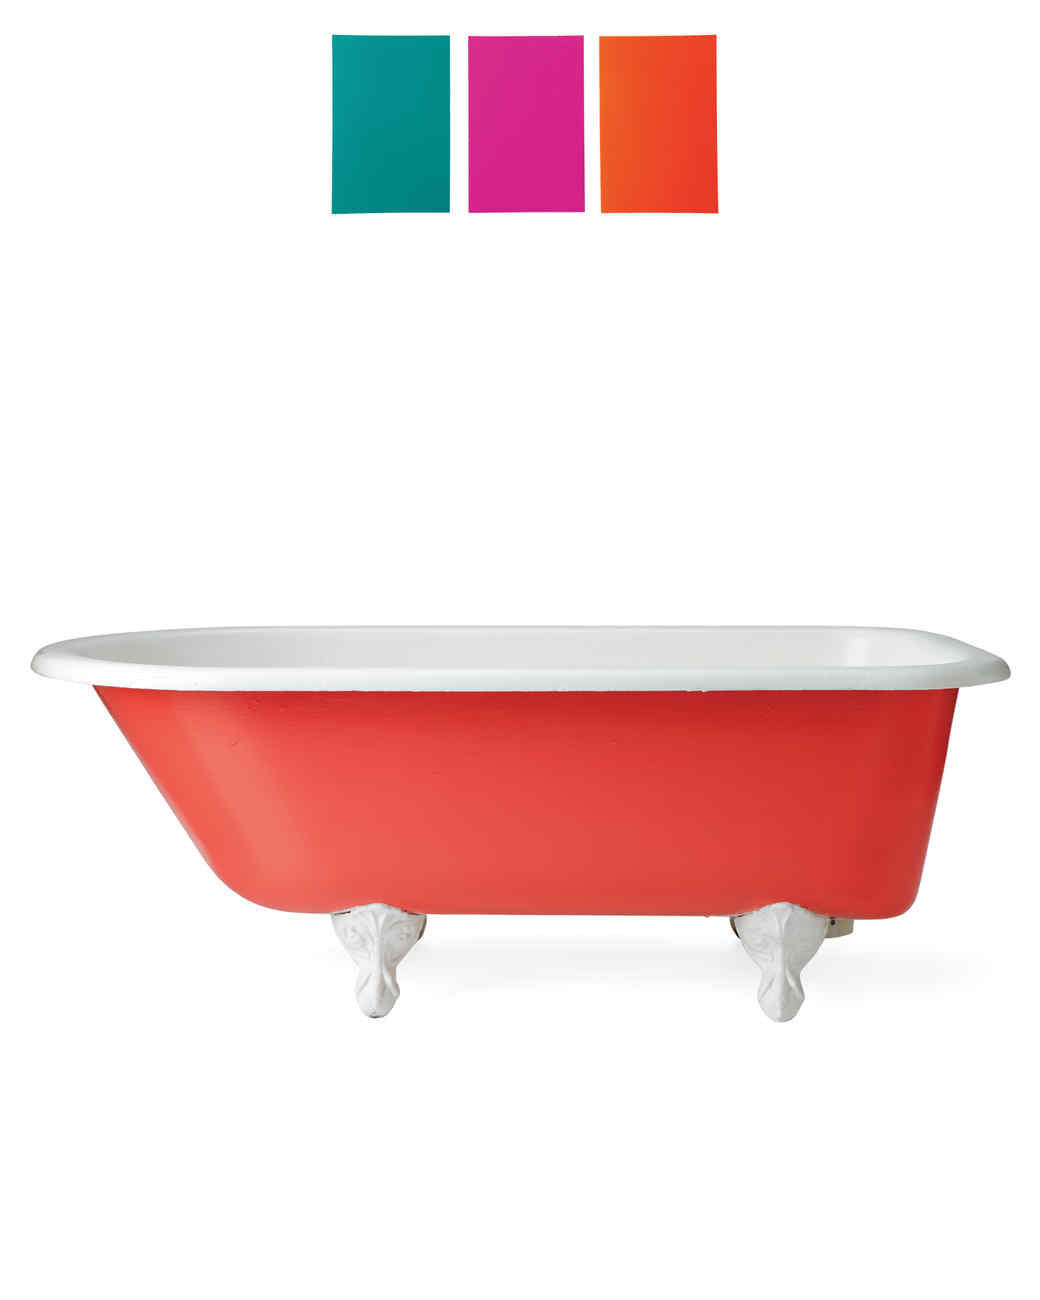 Famous Epoxy Paint For Bathtubs Gallery - Luxurious Bathtub Ideas ...